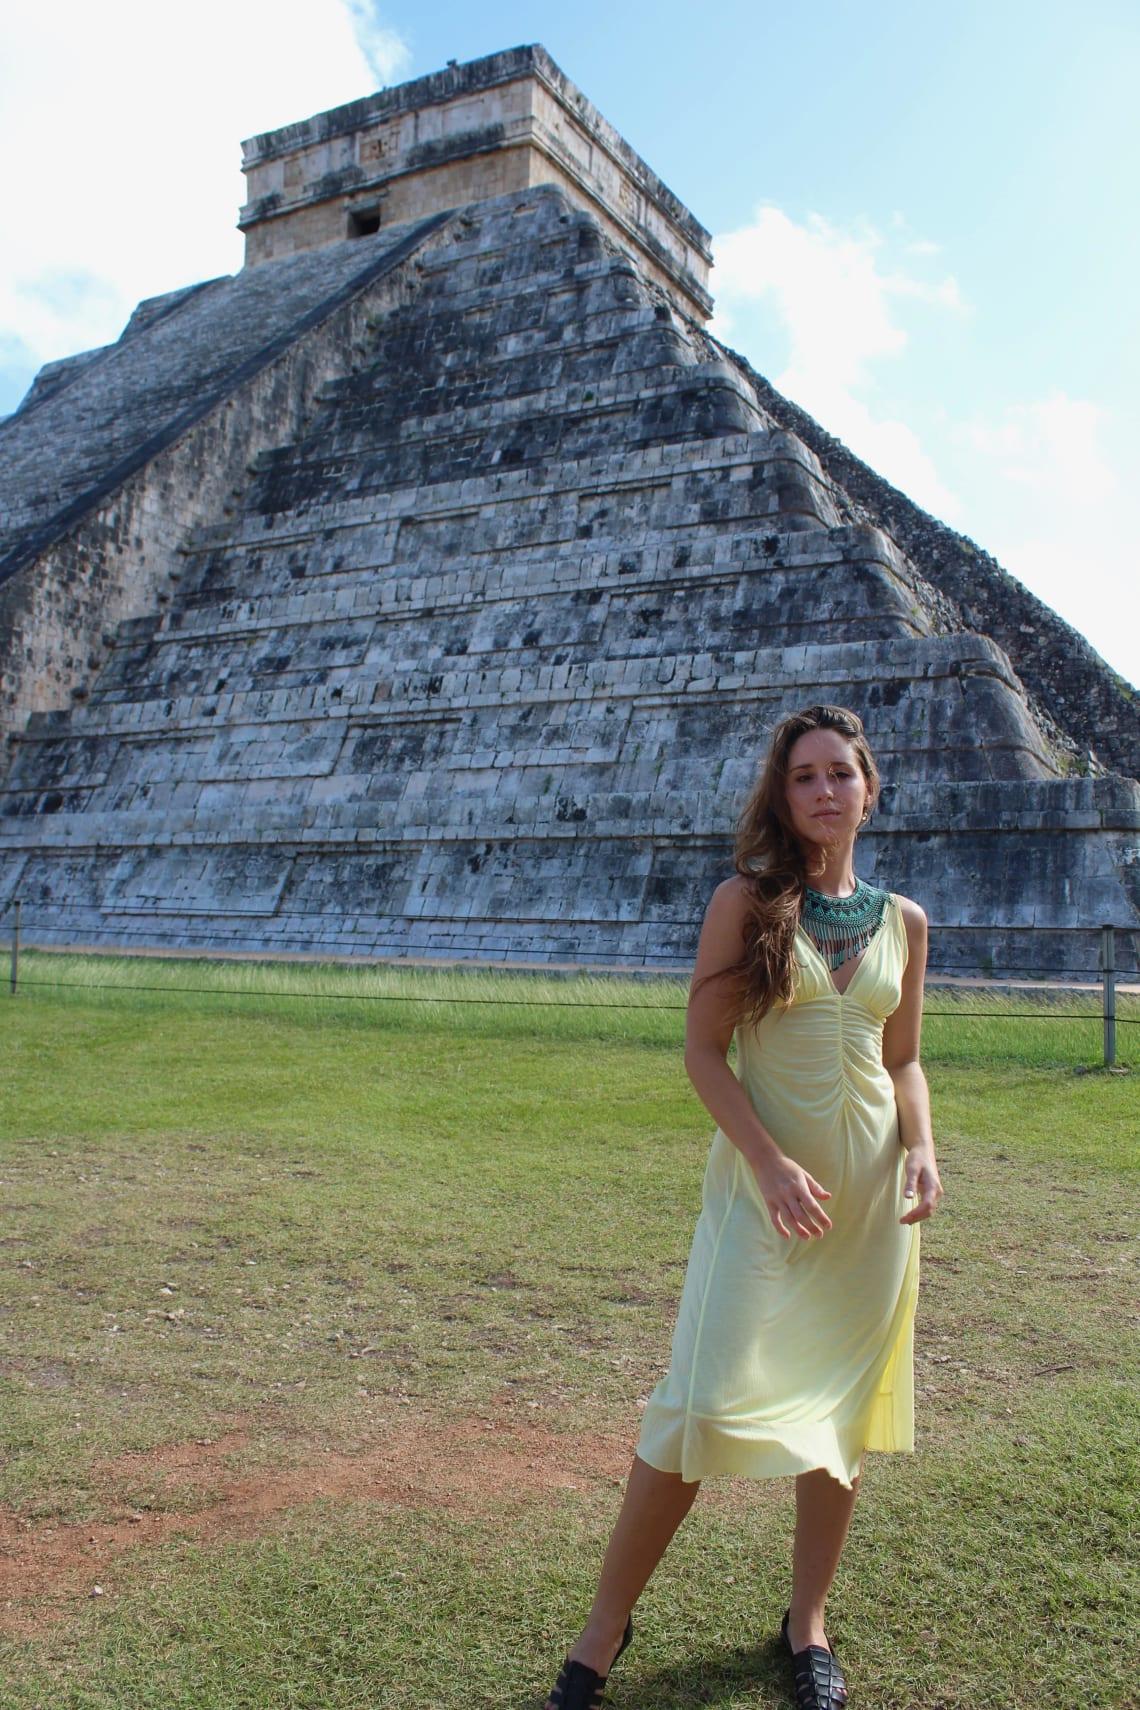 Temple of Kukulcan Step Pyramid, Chichen Itza, Mayan Riviera, Mexico.